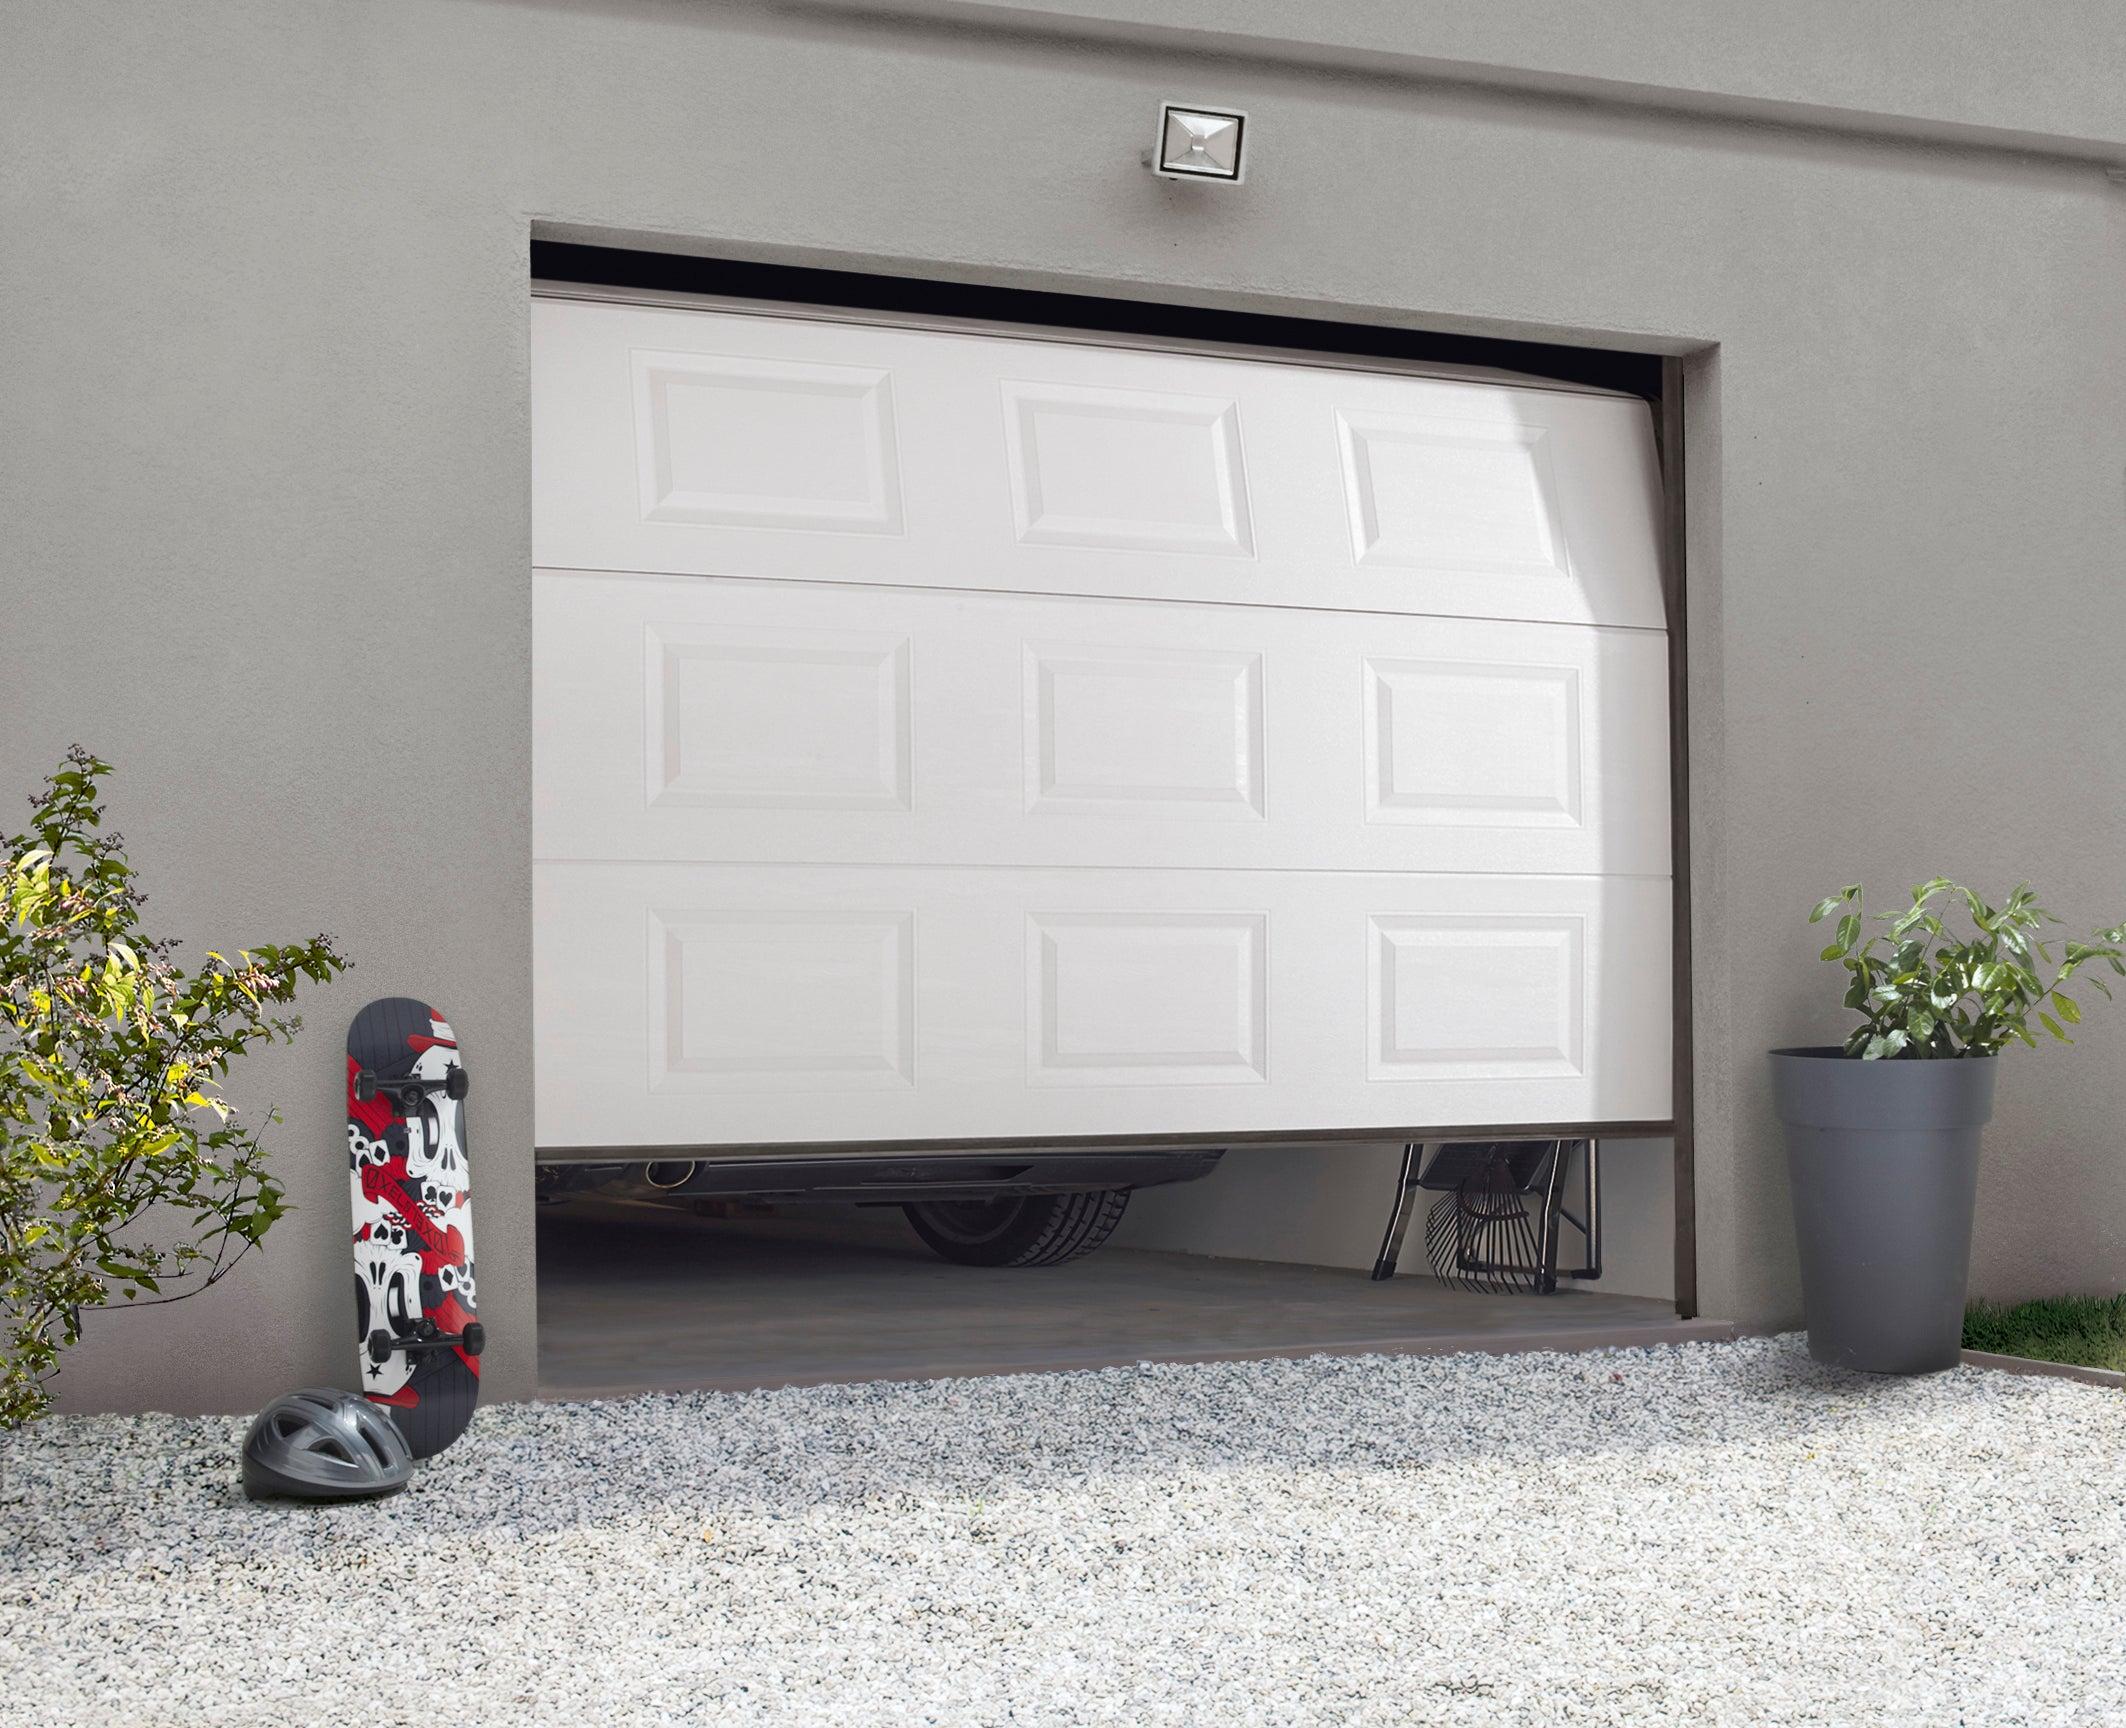 Porte De Garage Sectionnelle Motorisee Artens Essentiel H 200 X L 240 Cm Leroy Merlin